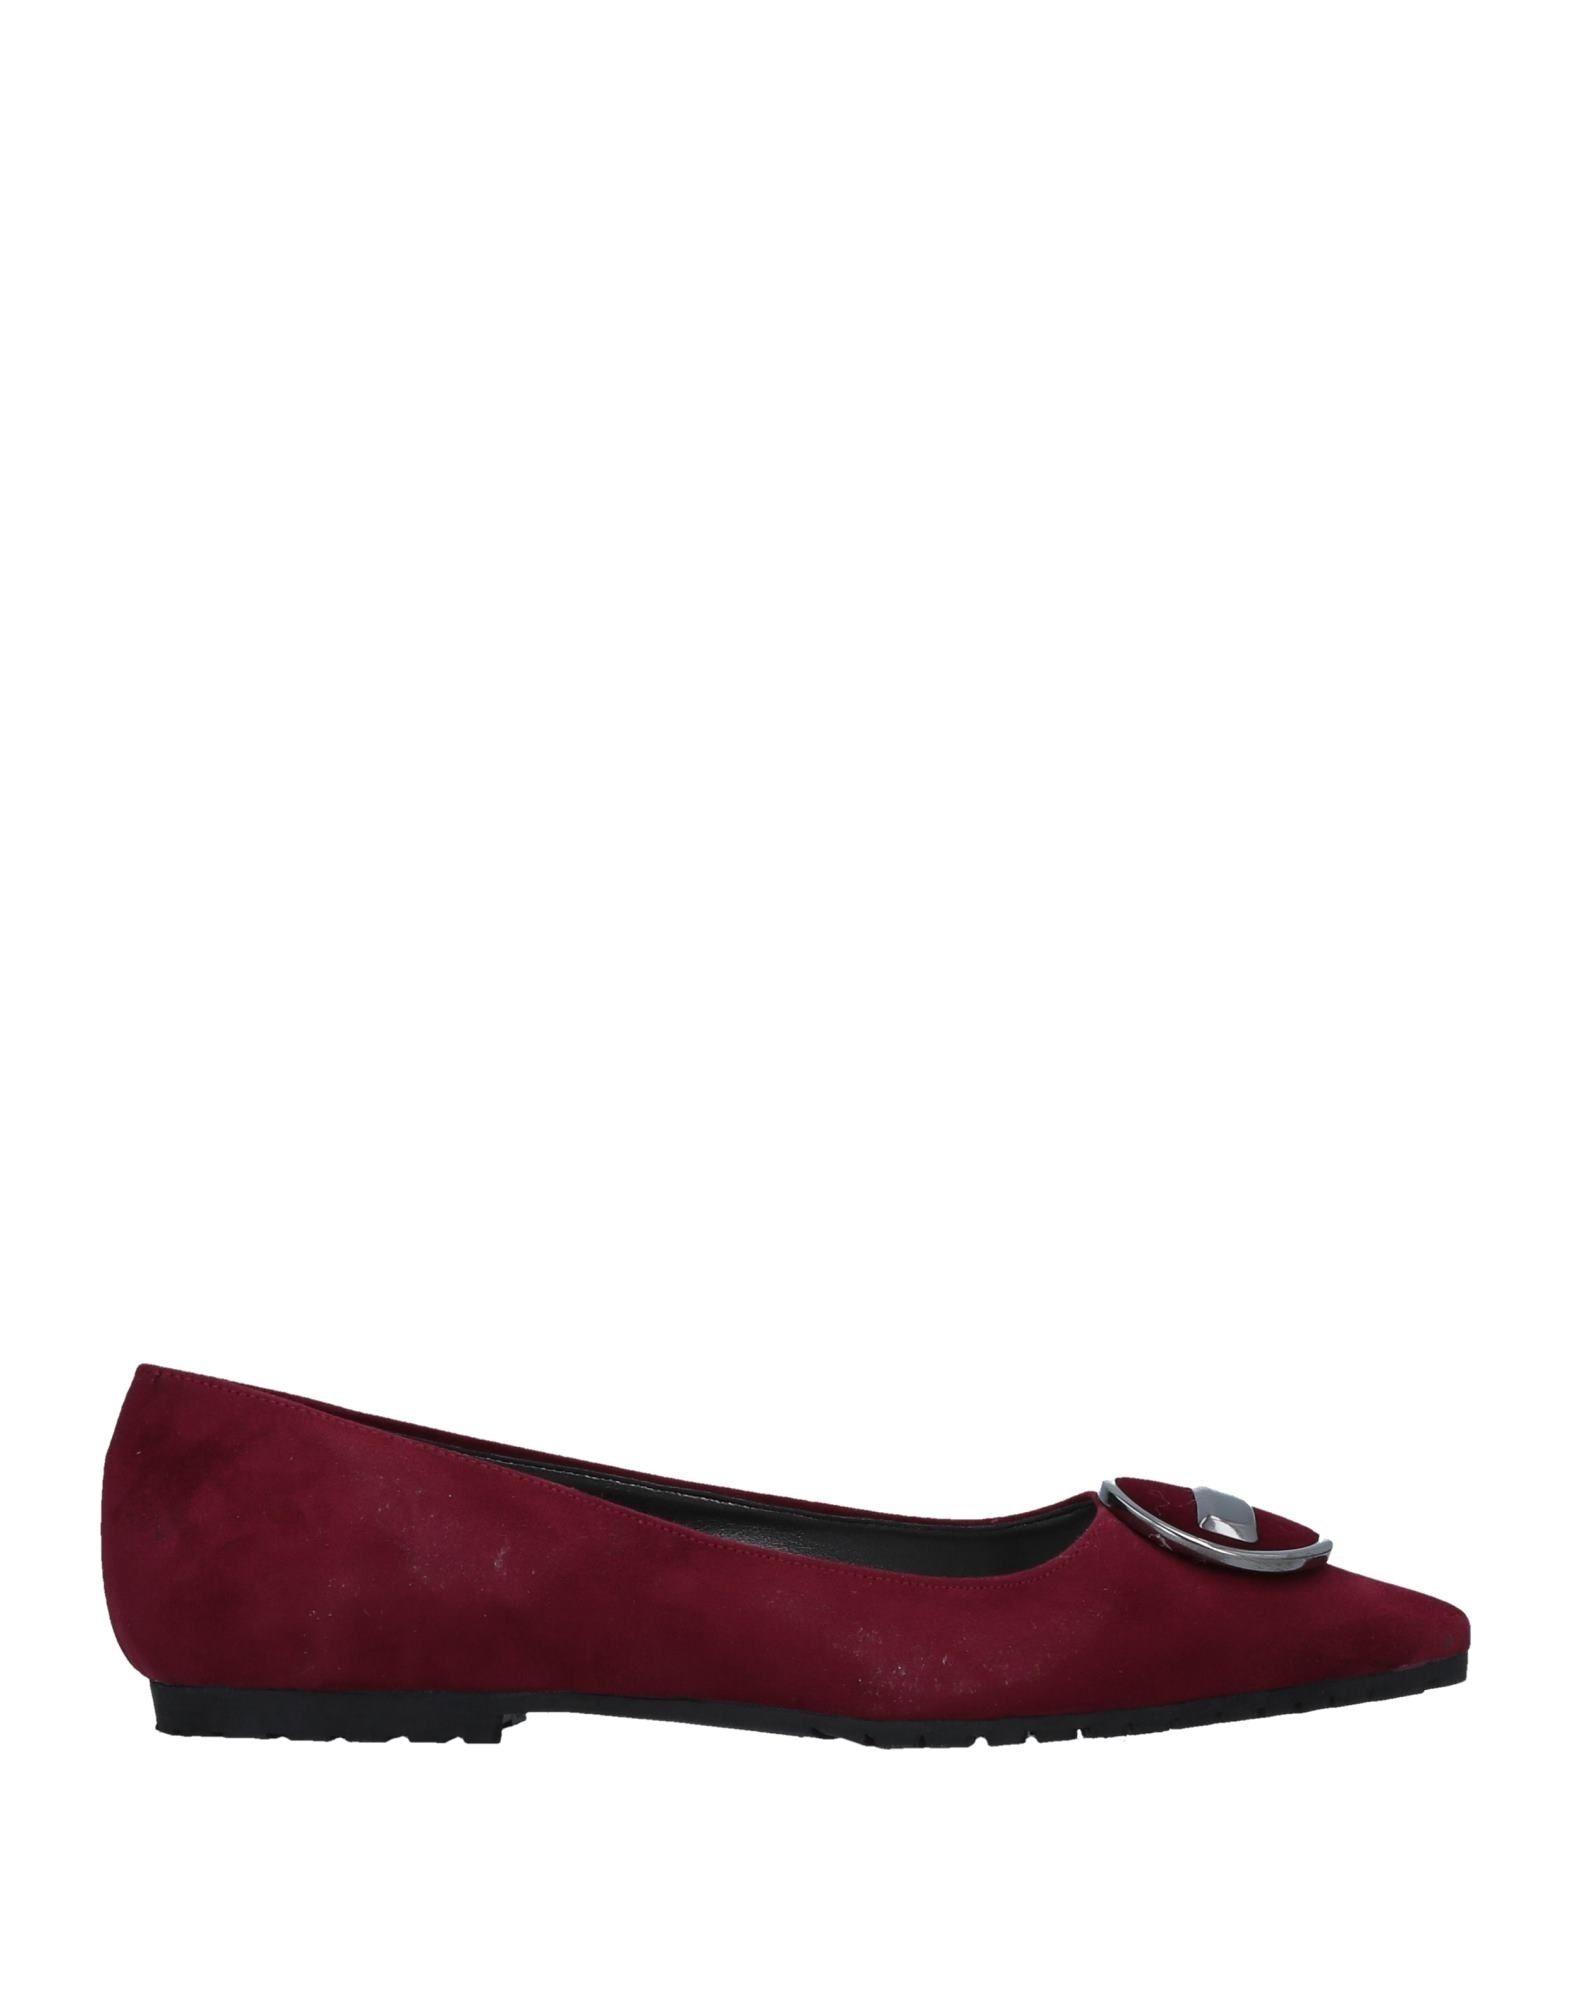 Vivian Ballerinas Damen  11506588QH Gute Qualität beliebte Schuhe